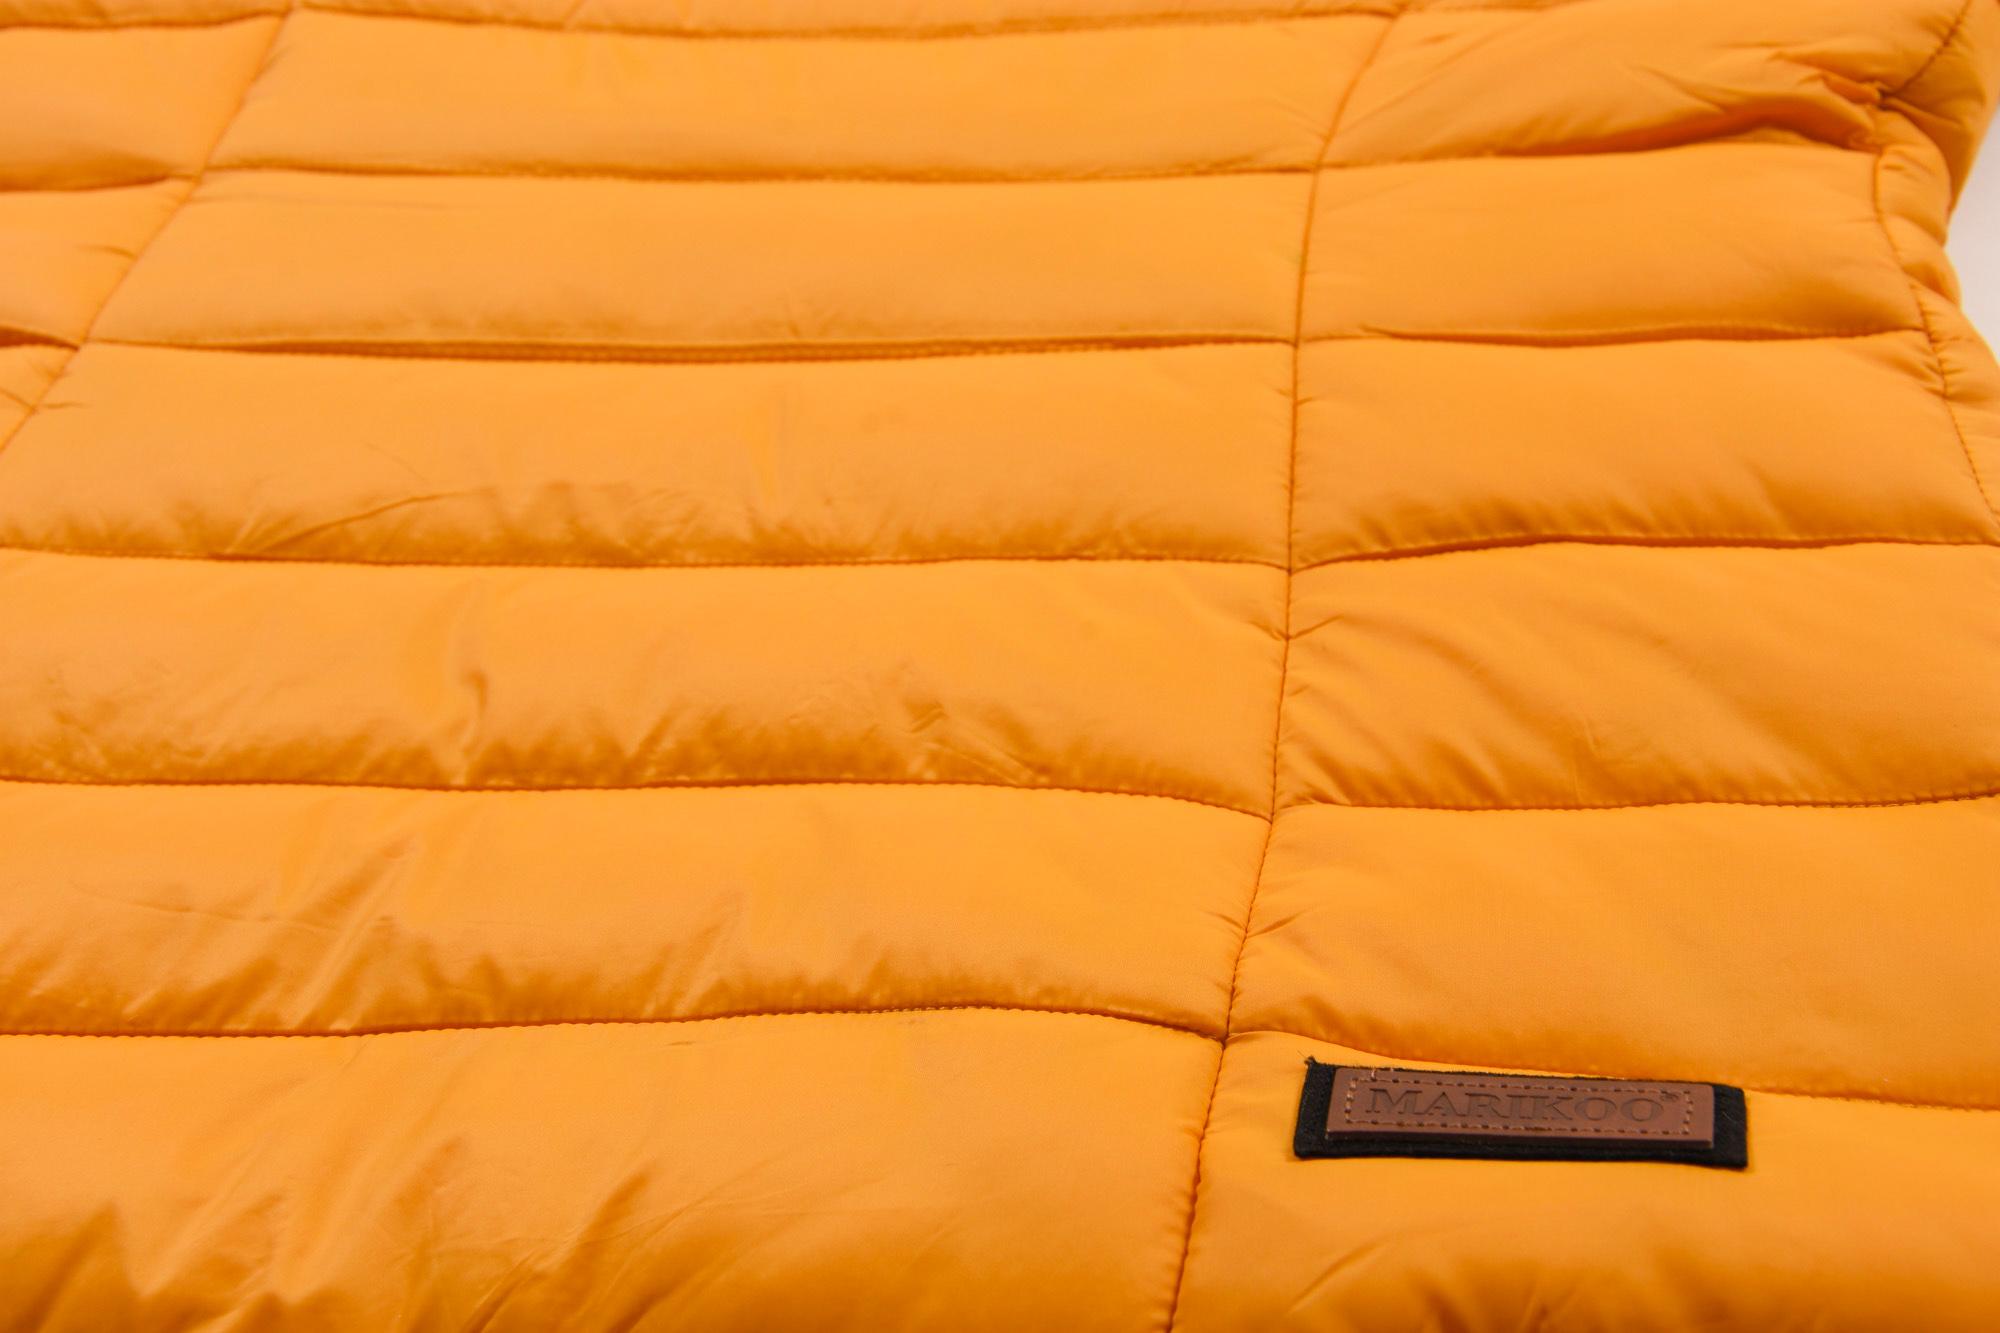 Marikoo-Lucy-Damen-Jacke-Steppjacke-Ubergangsjacke-gesteppt-Stepp-NEU-B651 Indexbild 19